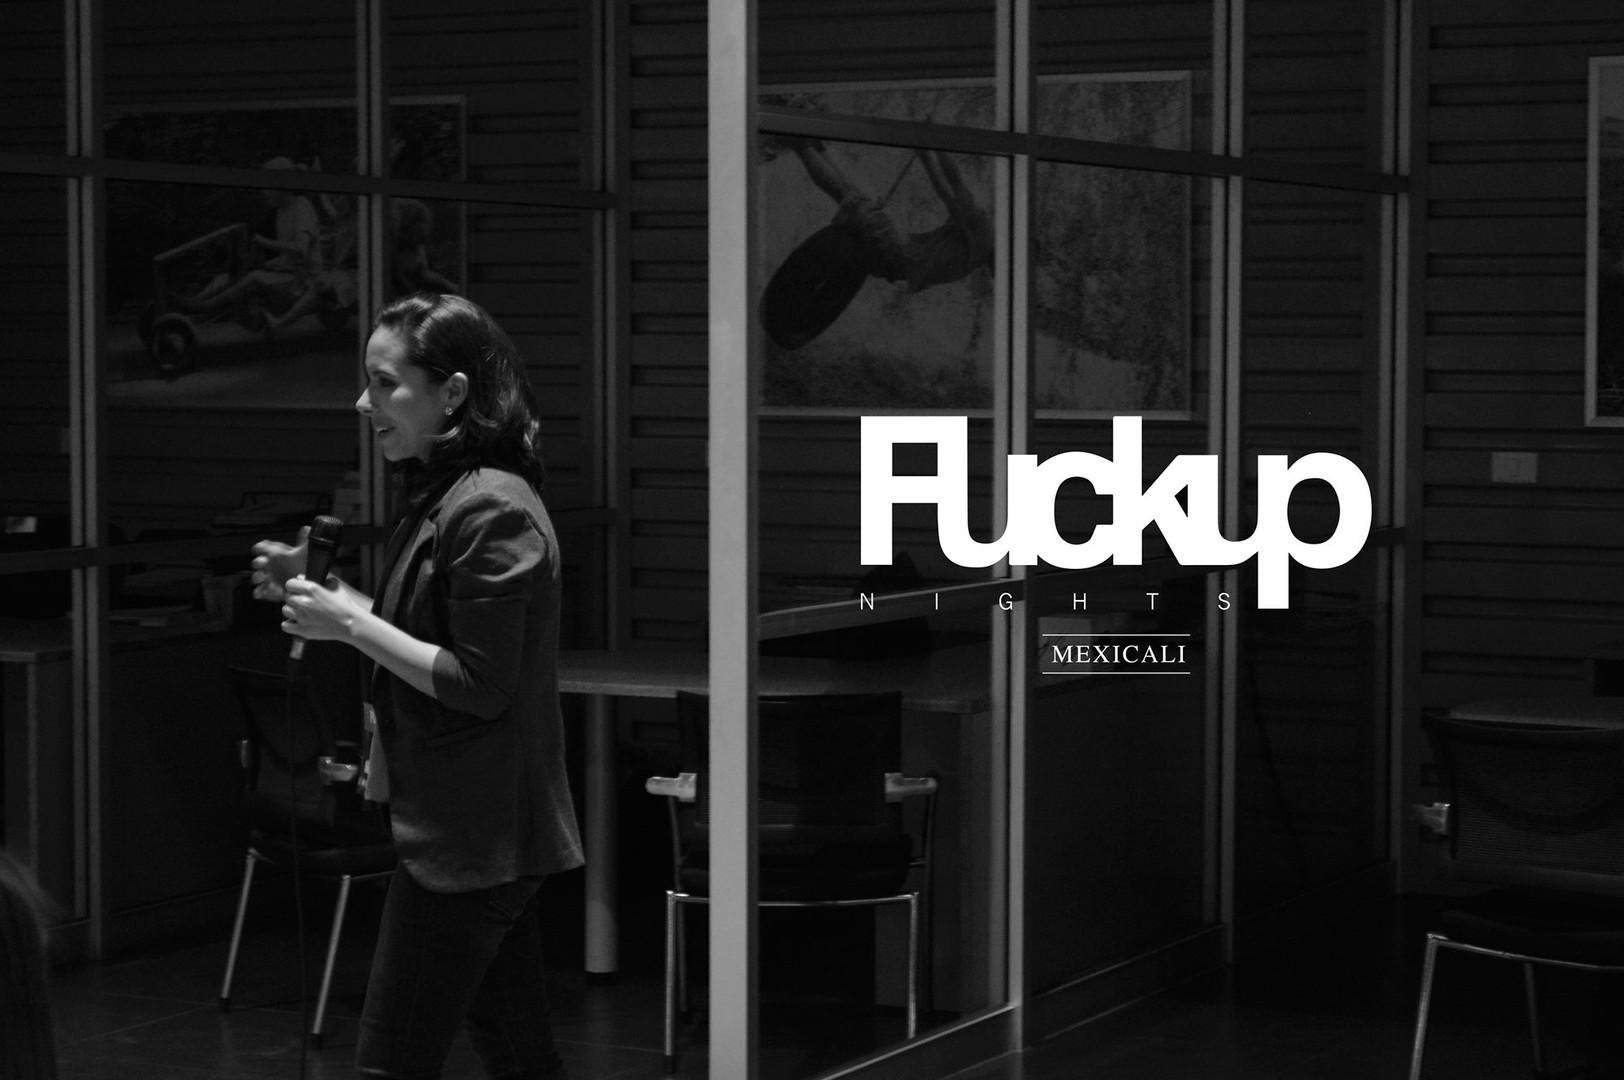 Fuckup Nights 2017